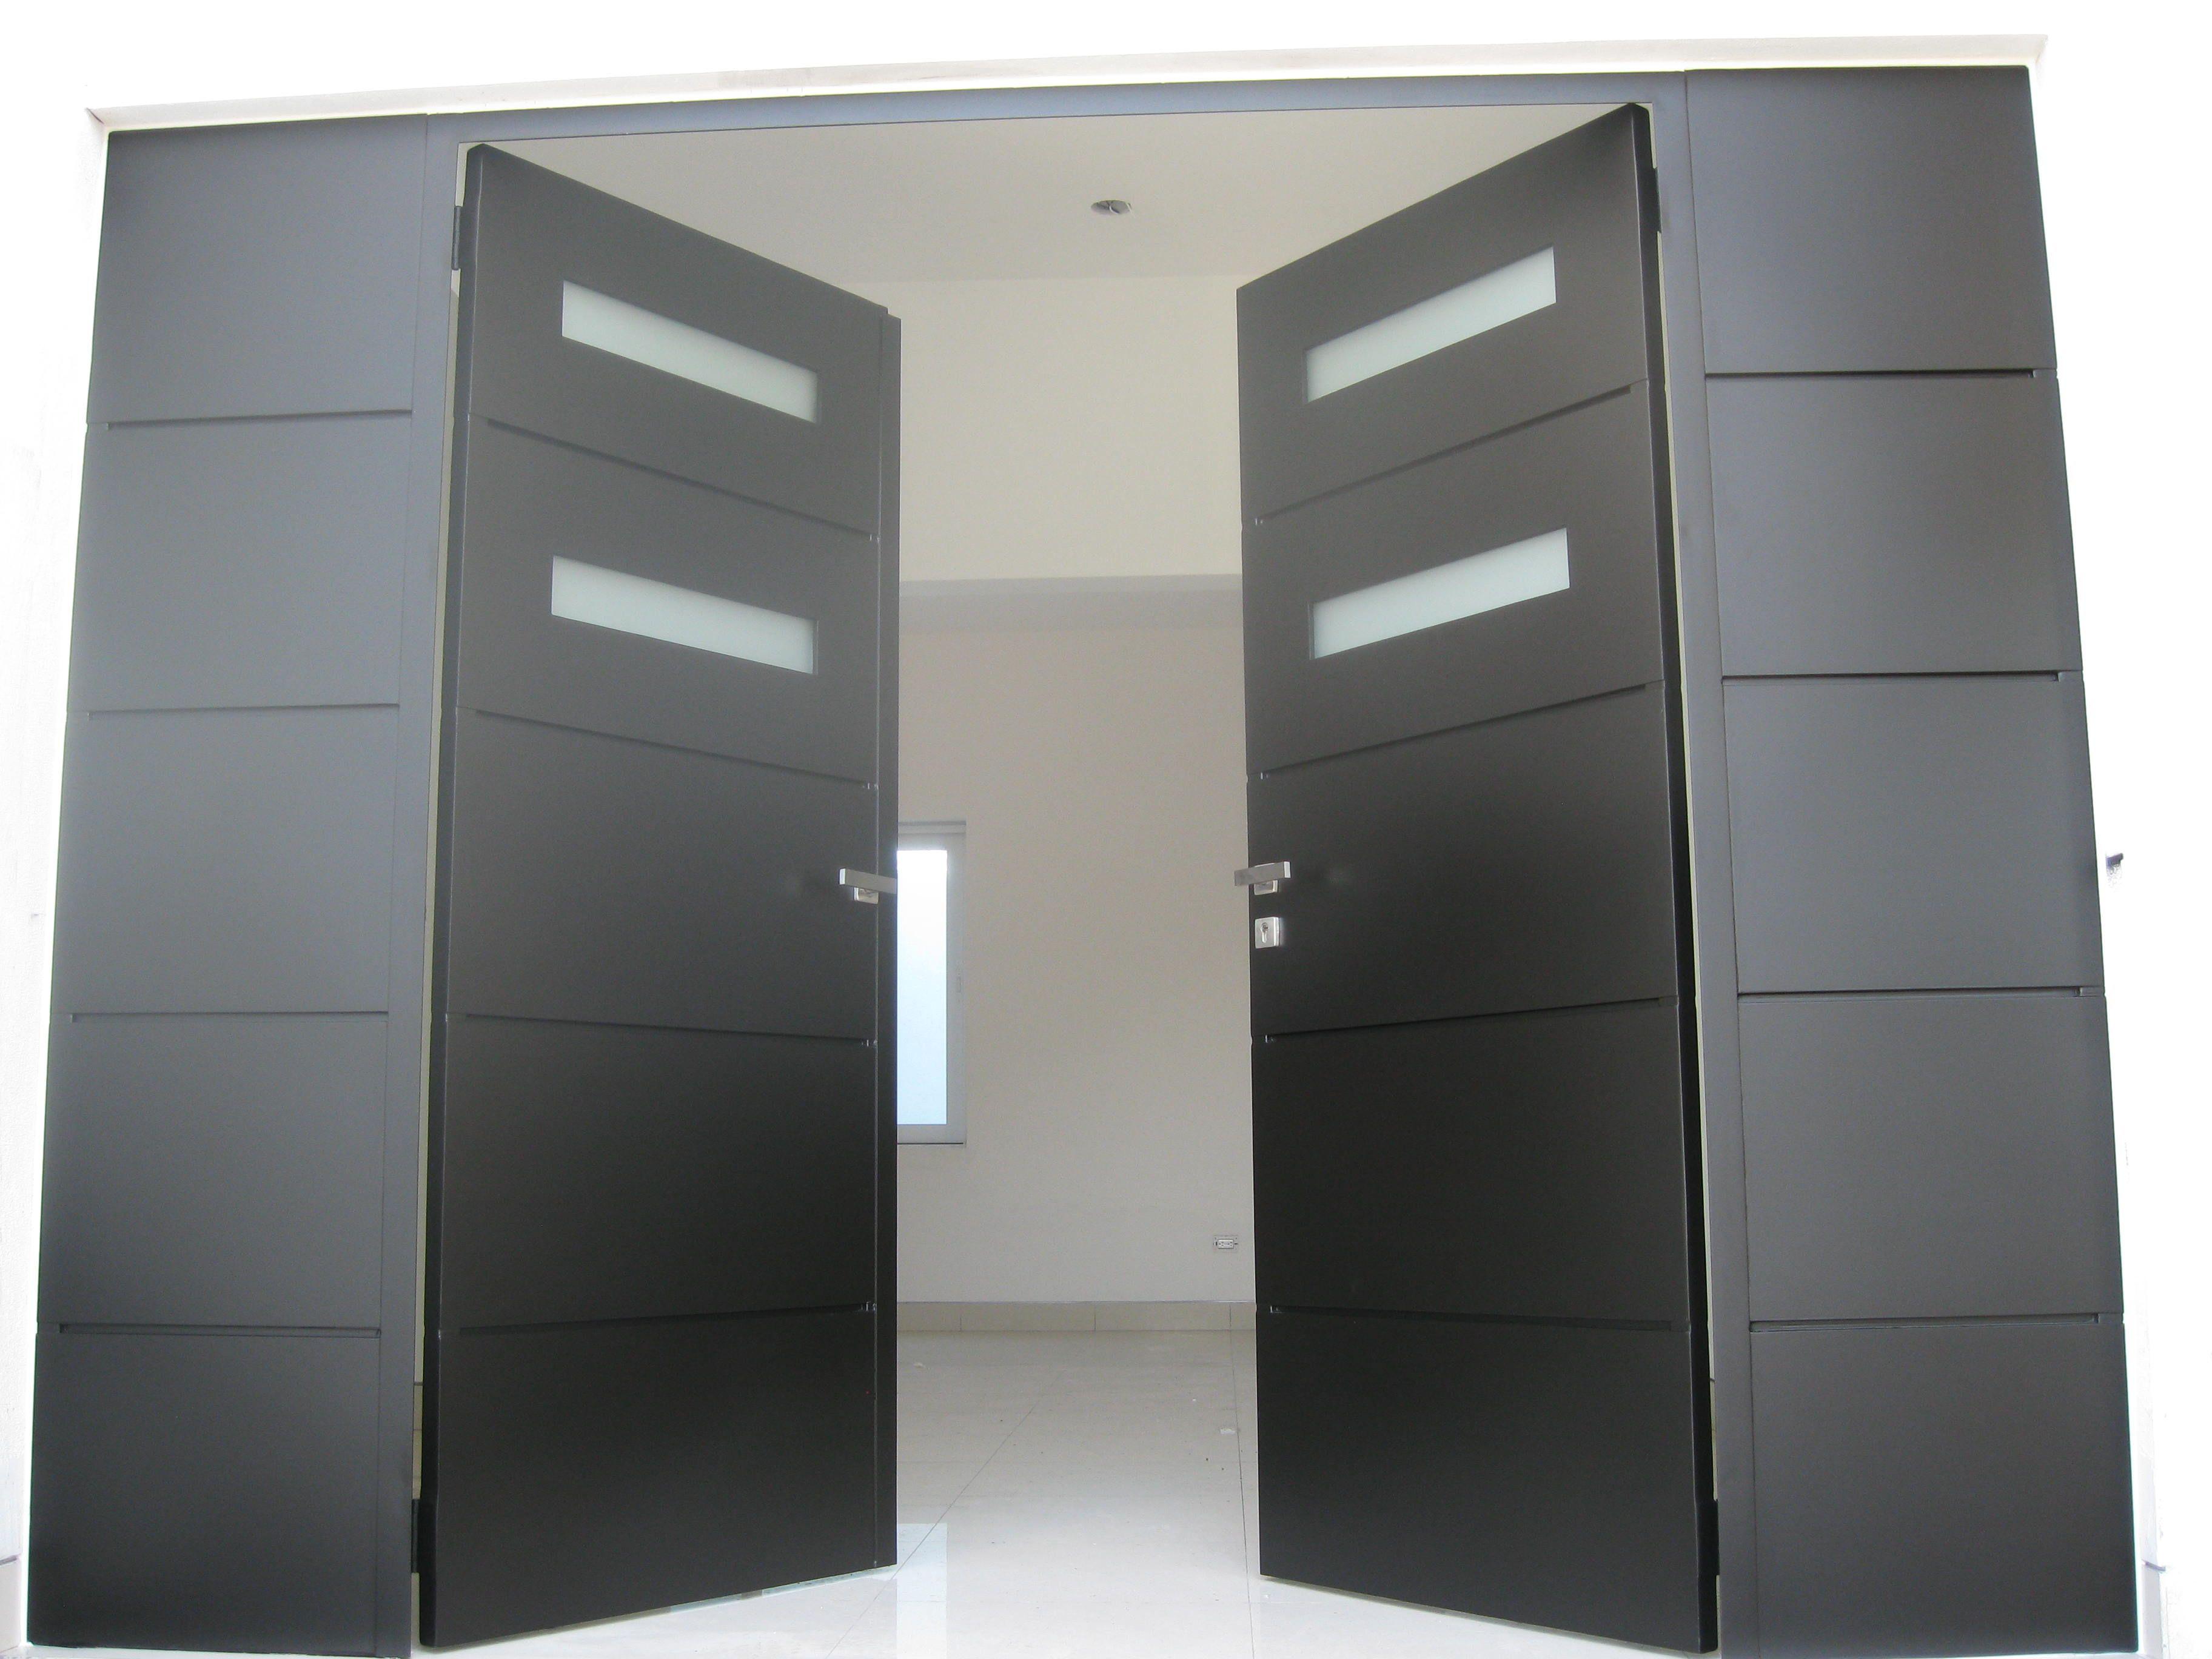 Porton pta portones dise os pinterest pta and doors - Puertas disenos modernos ...